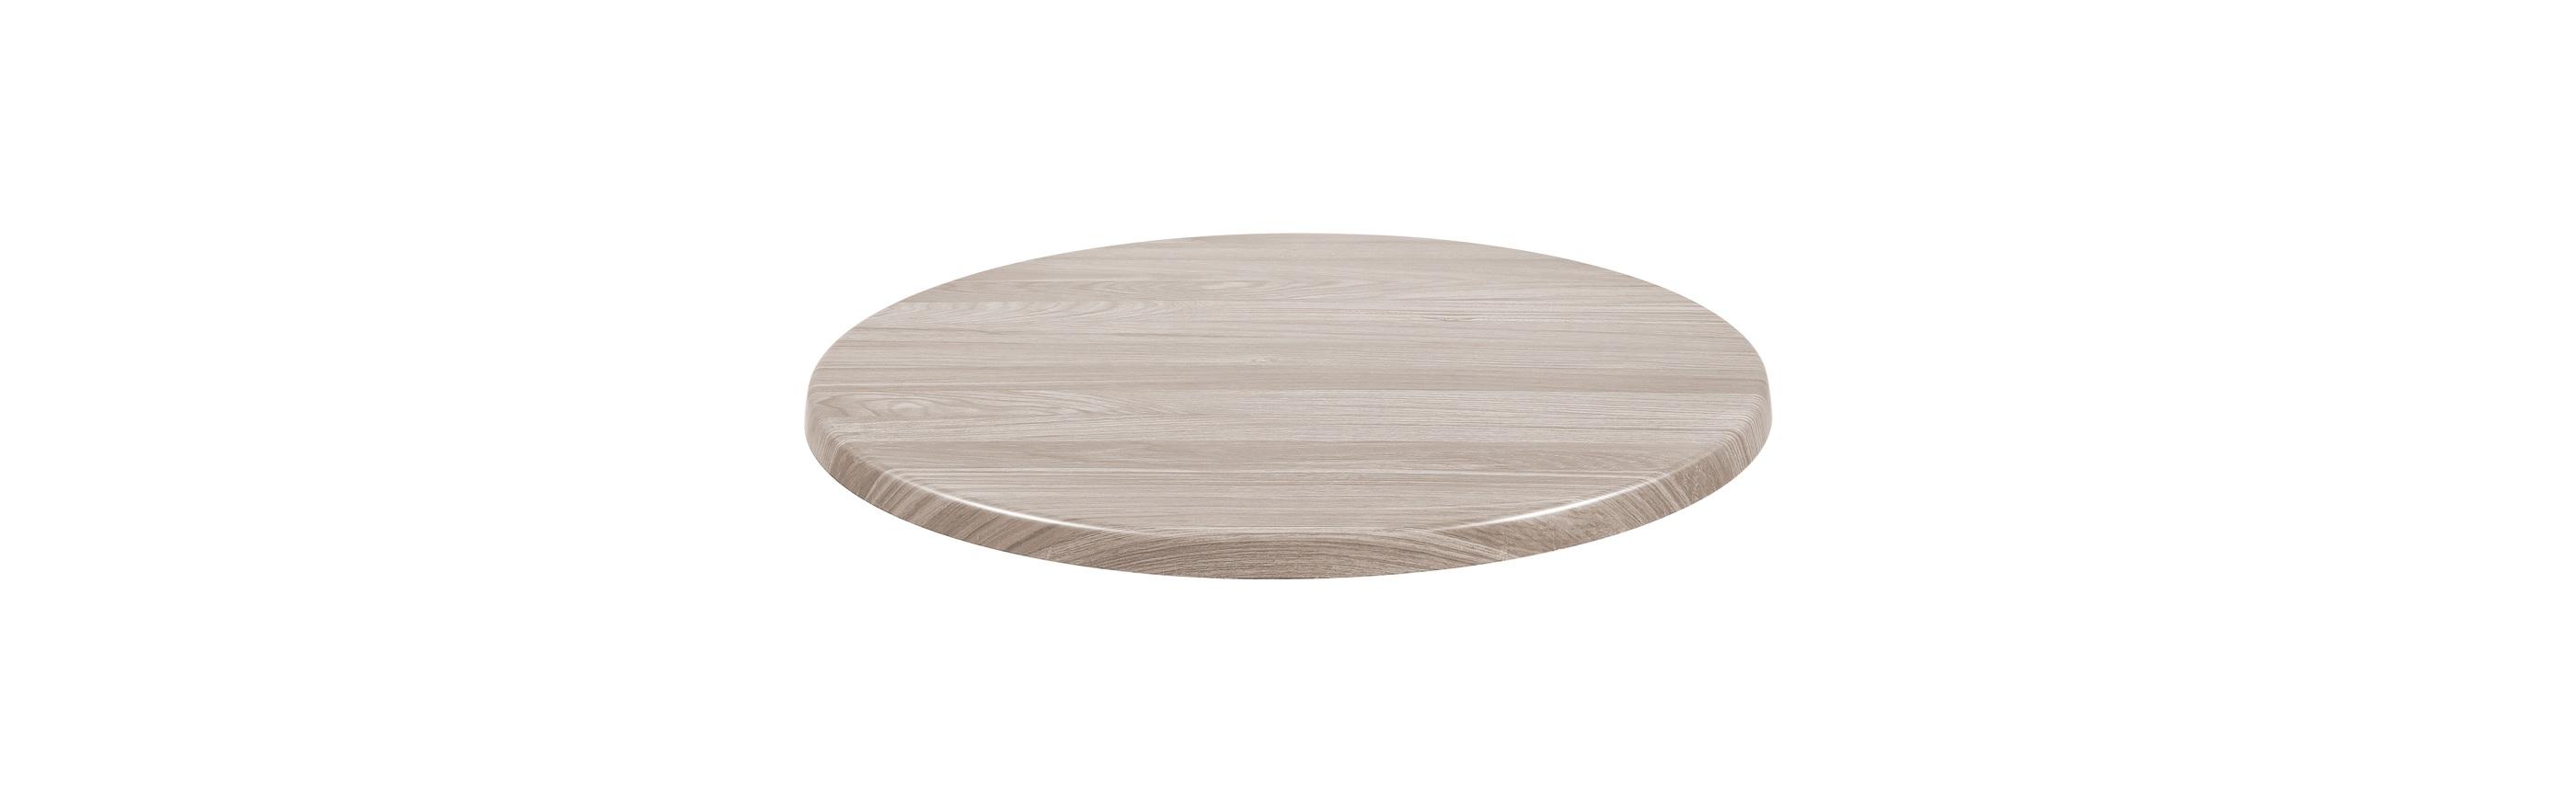 Messina oak